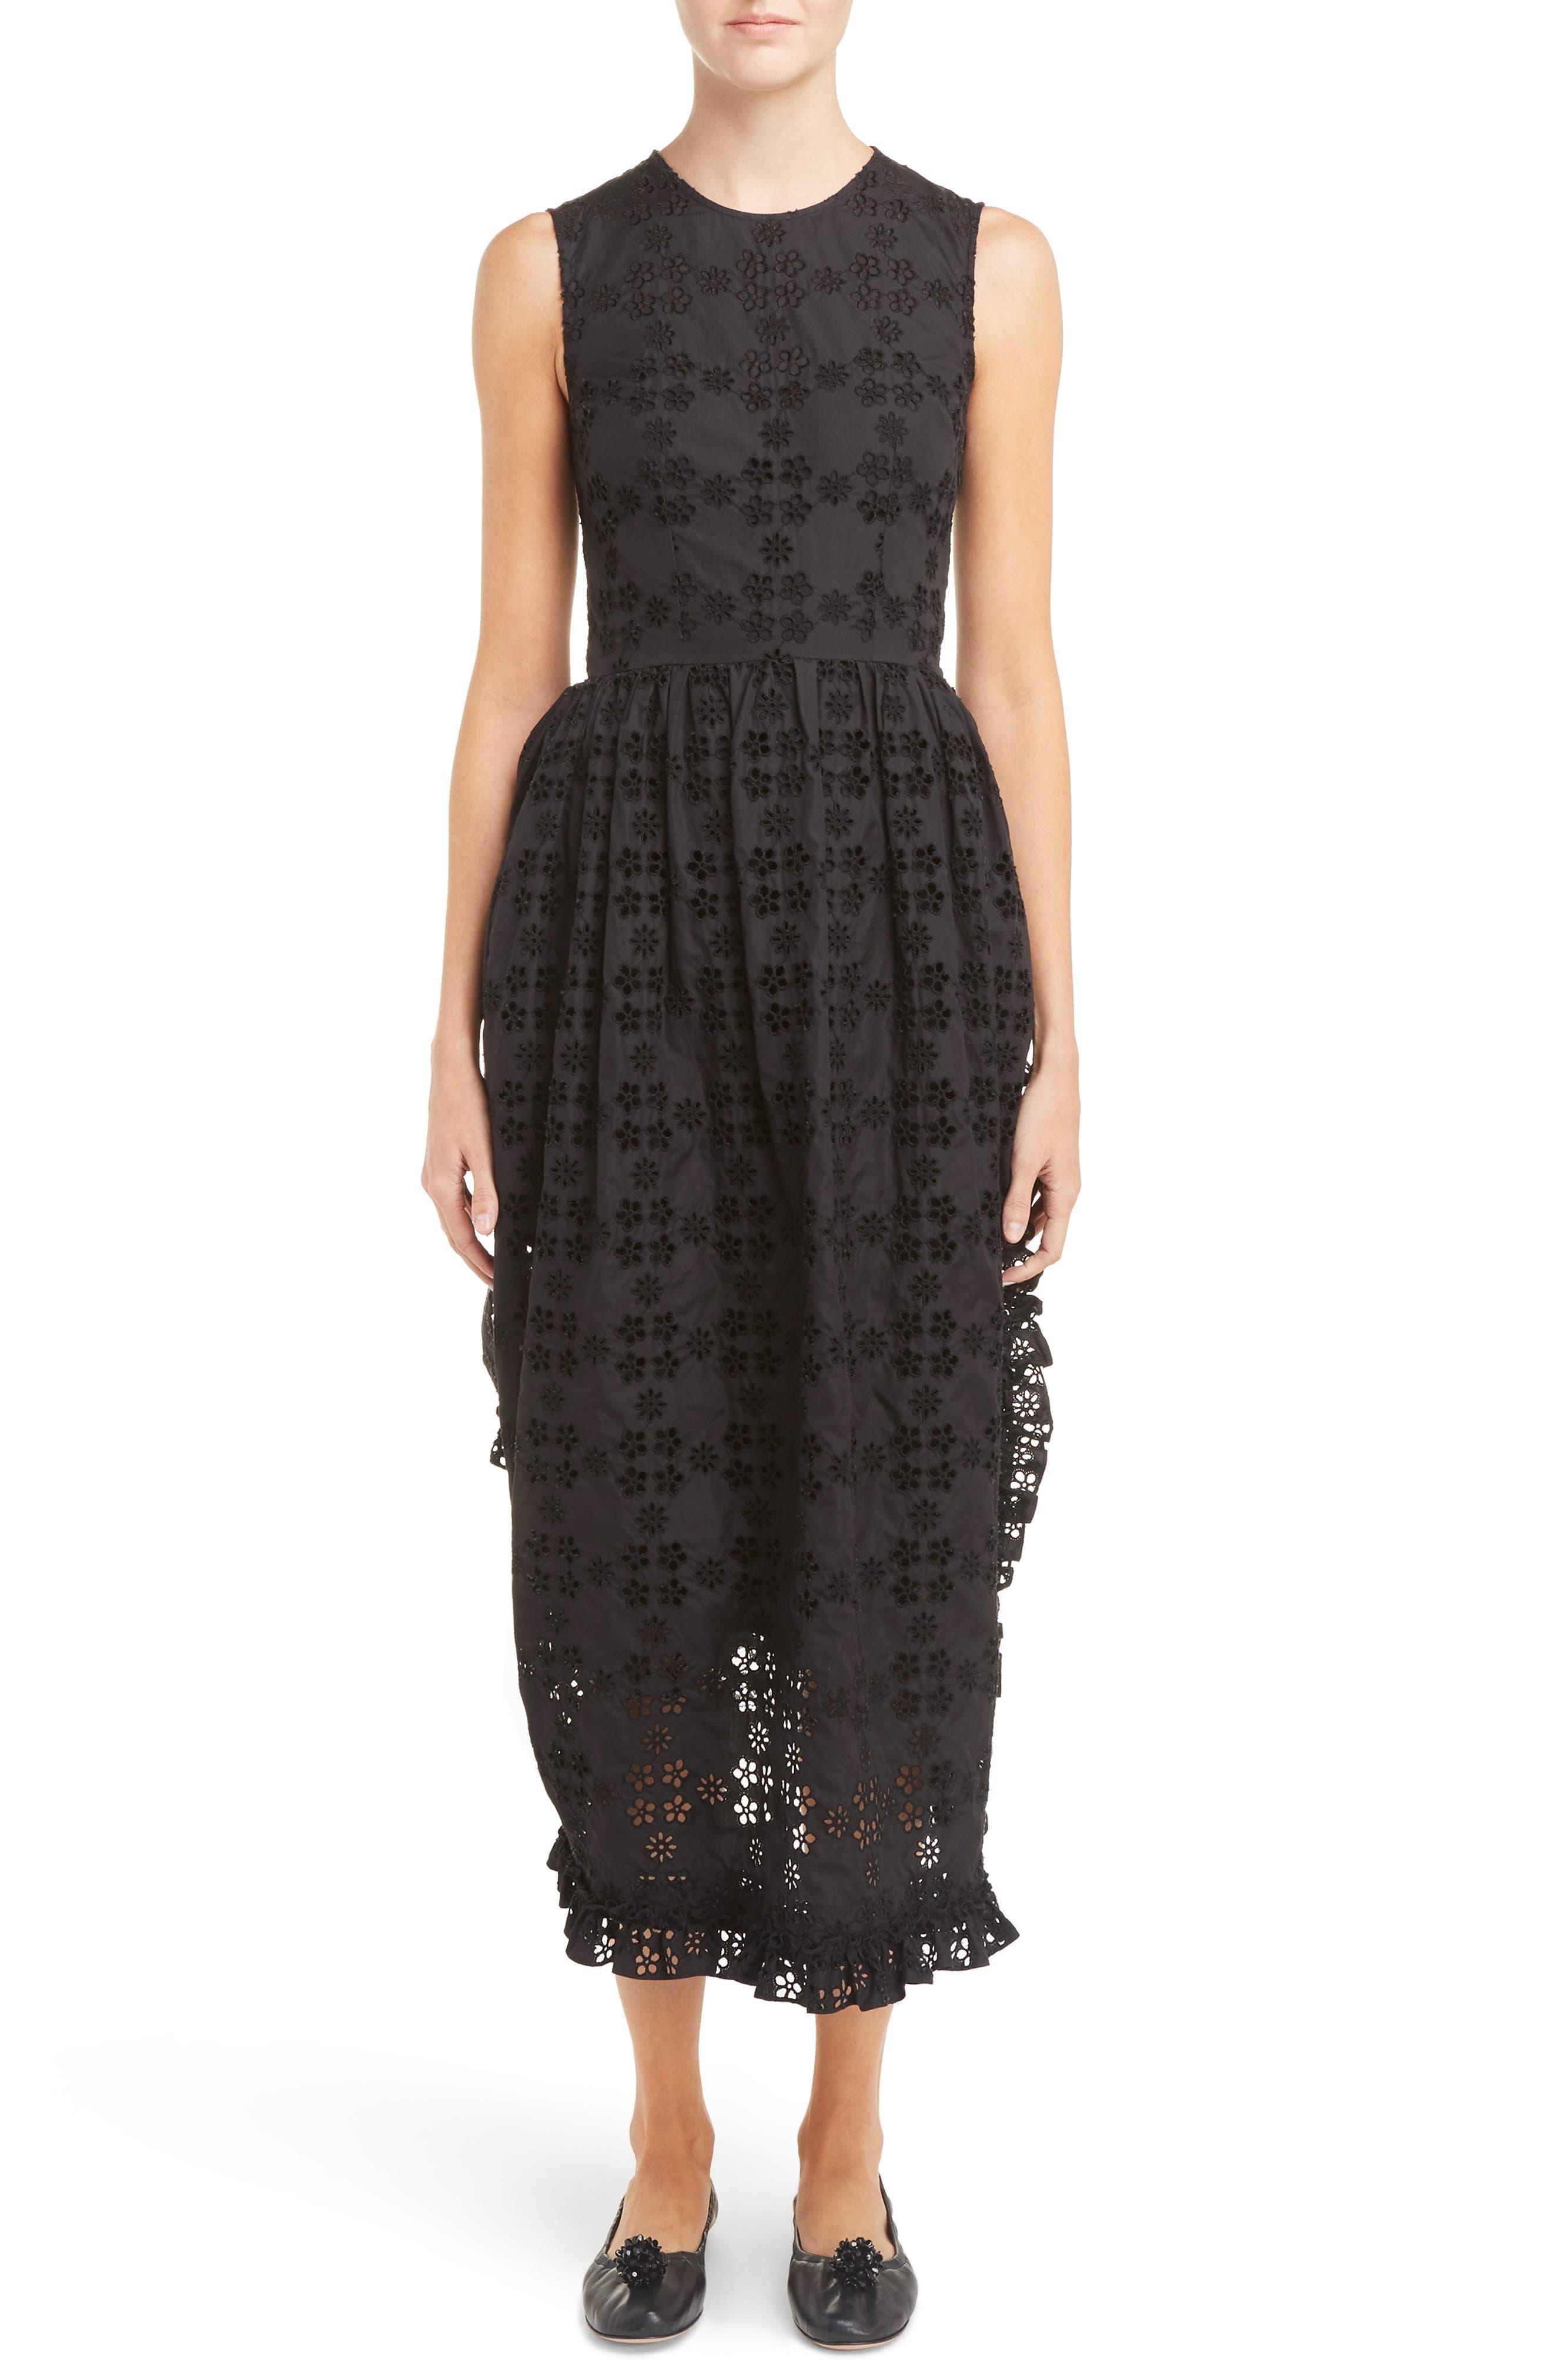 Alternate Image 1 Selected - Simone Rocha Eyelet Frill Dress